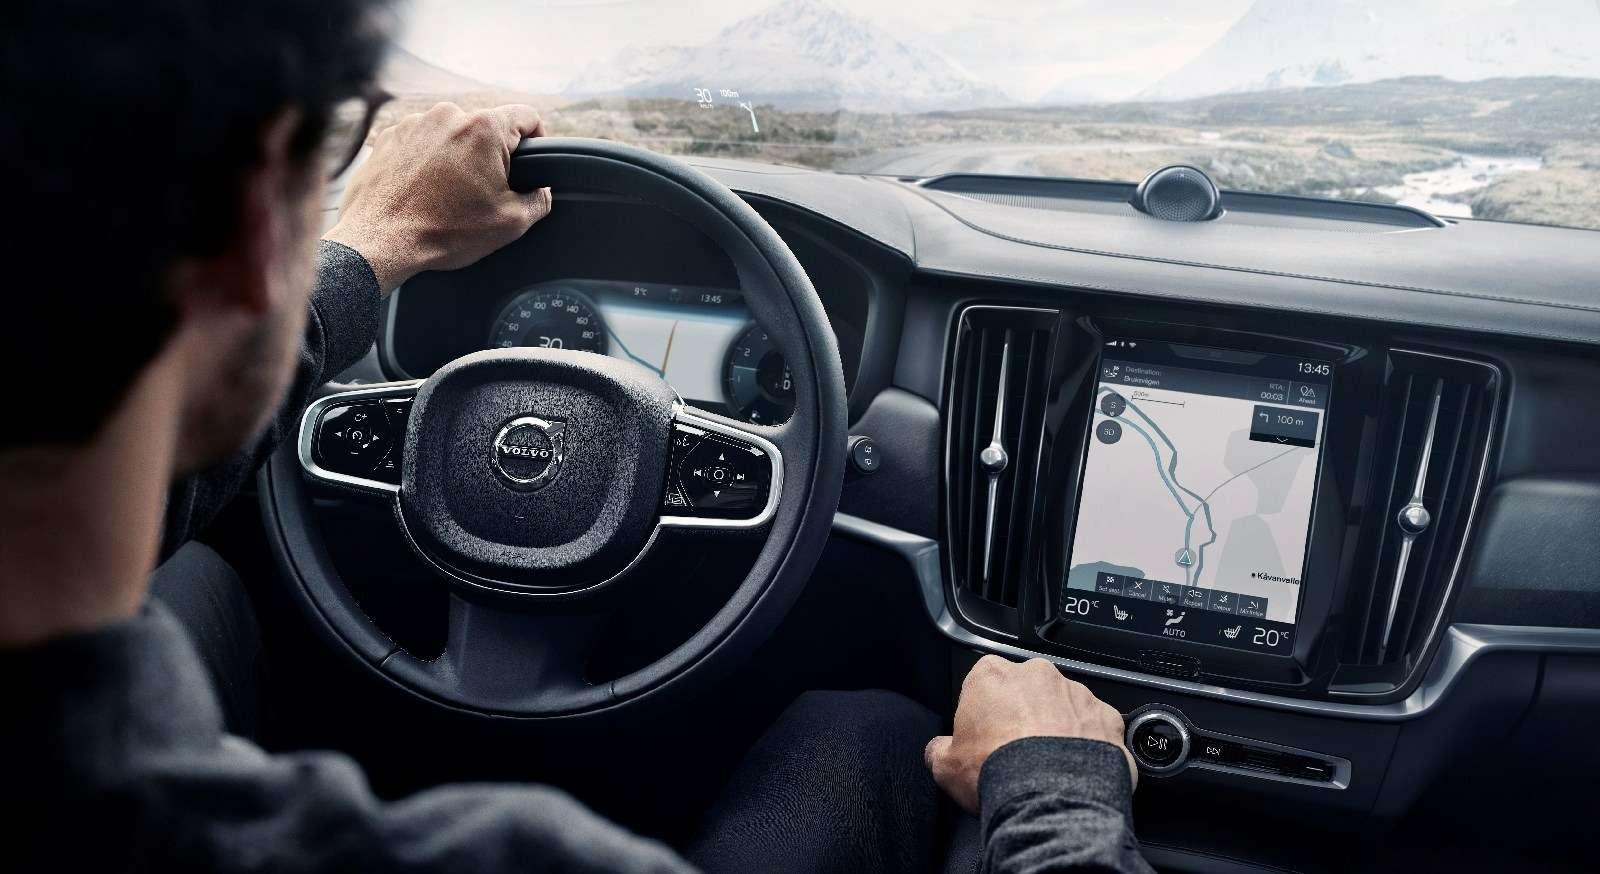 Такой «сарай» нам нужен: Volvo V90 Cross Country представлен официально— фото 635268